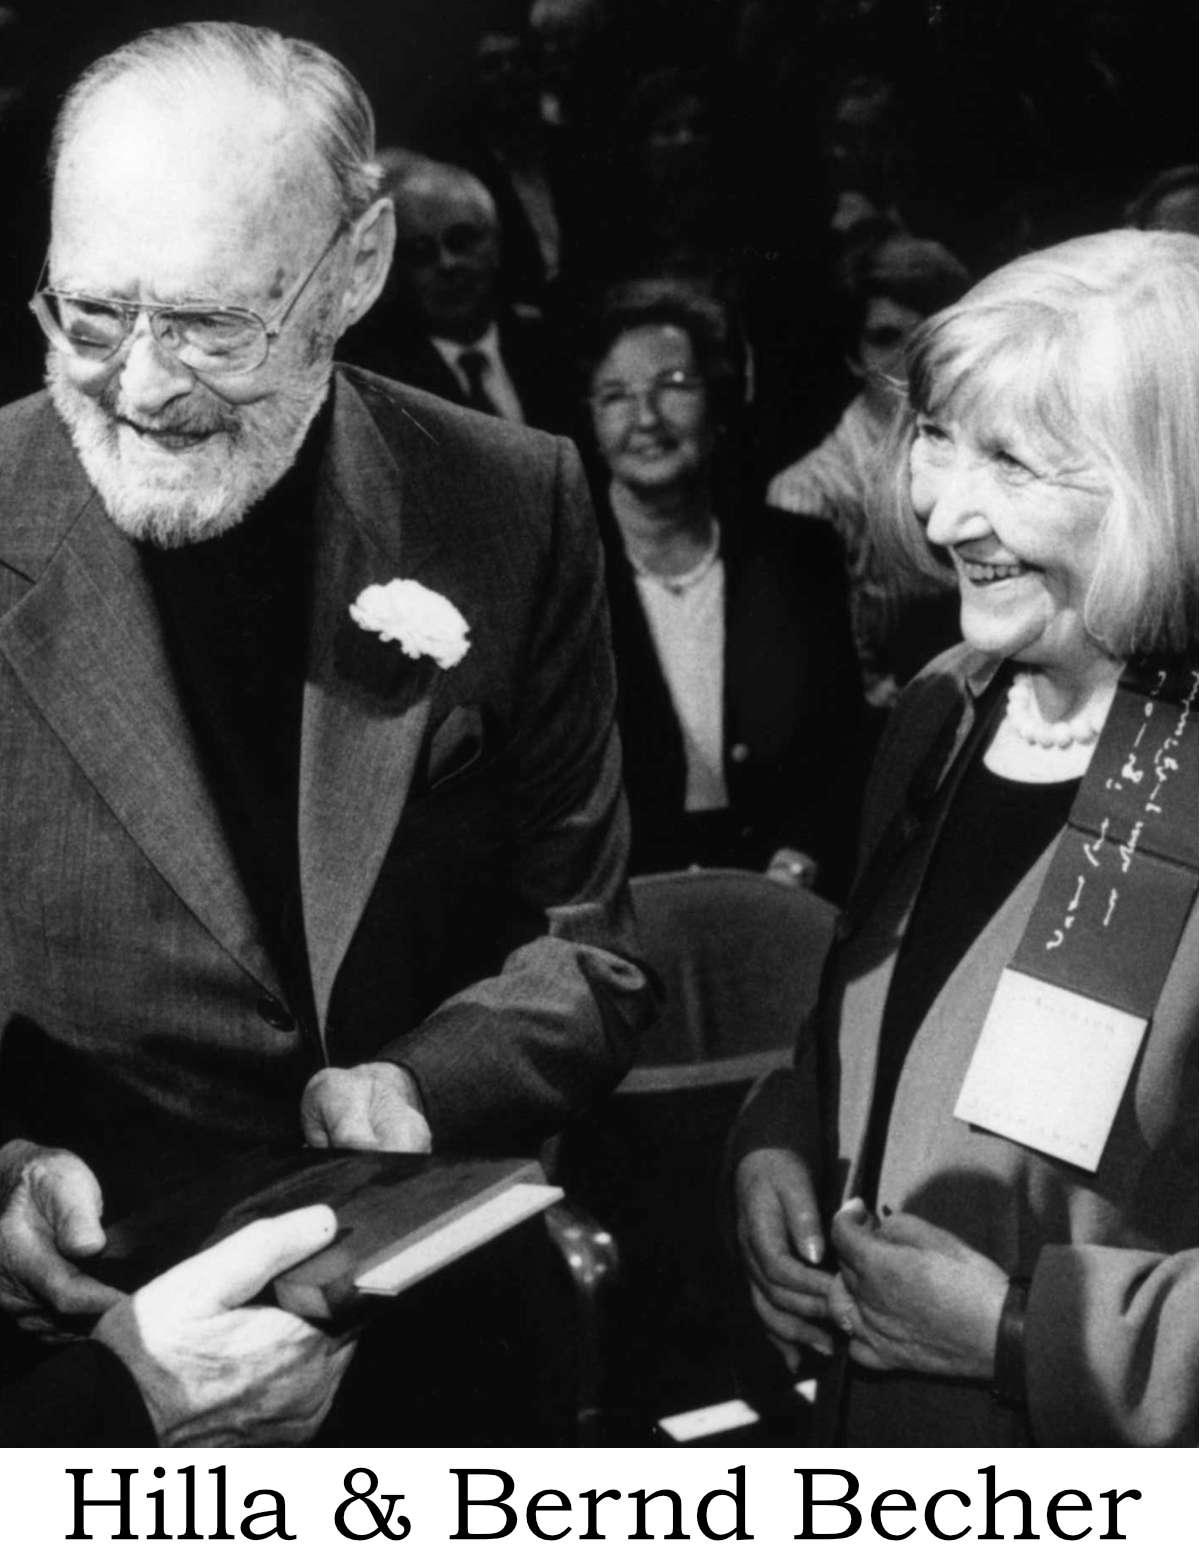 Hilla y Bernd Becher